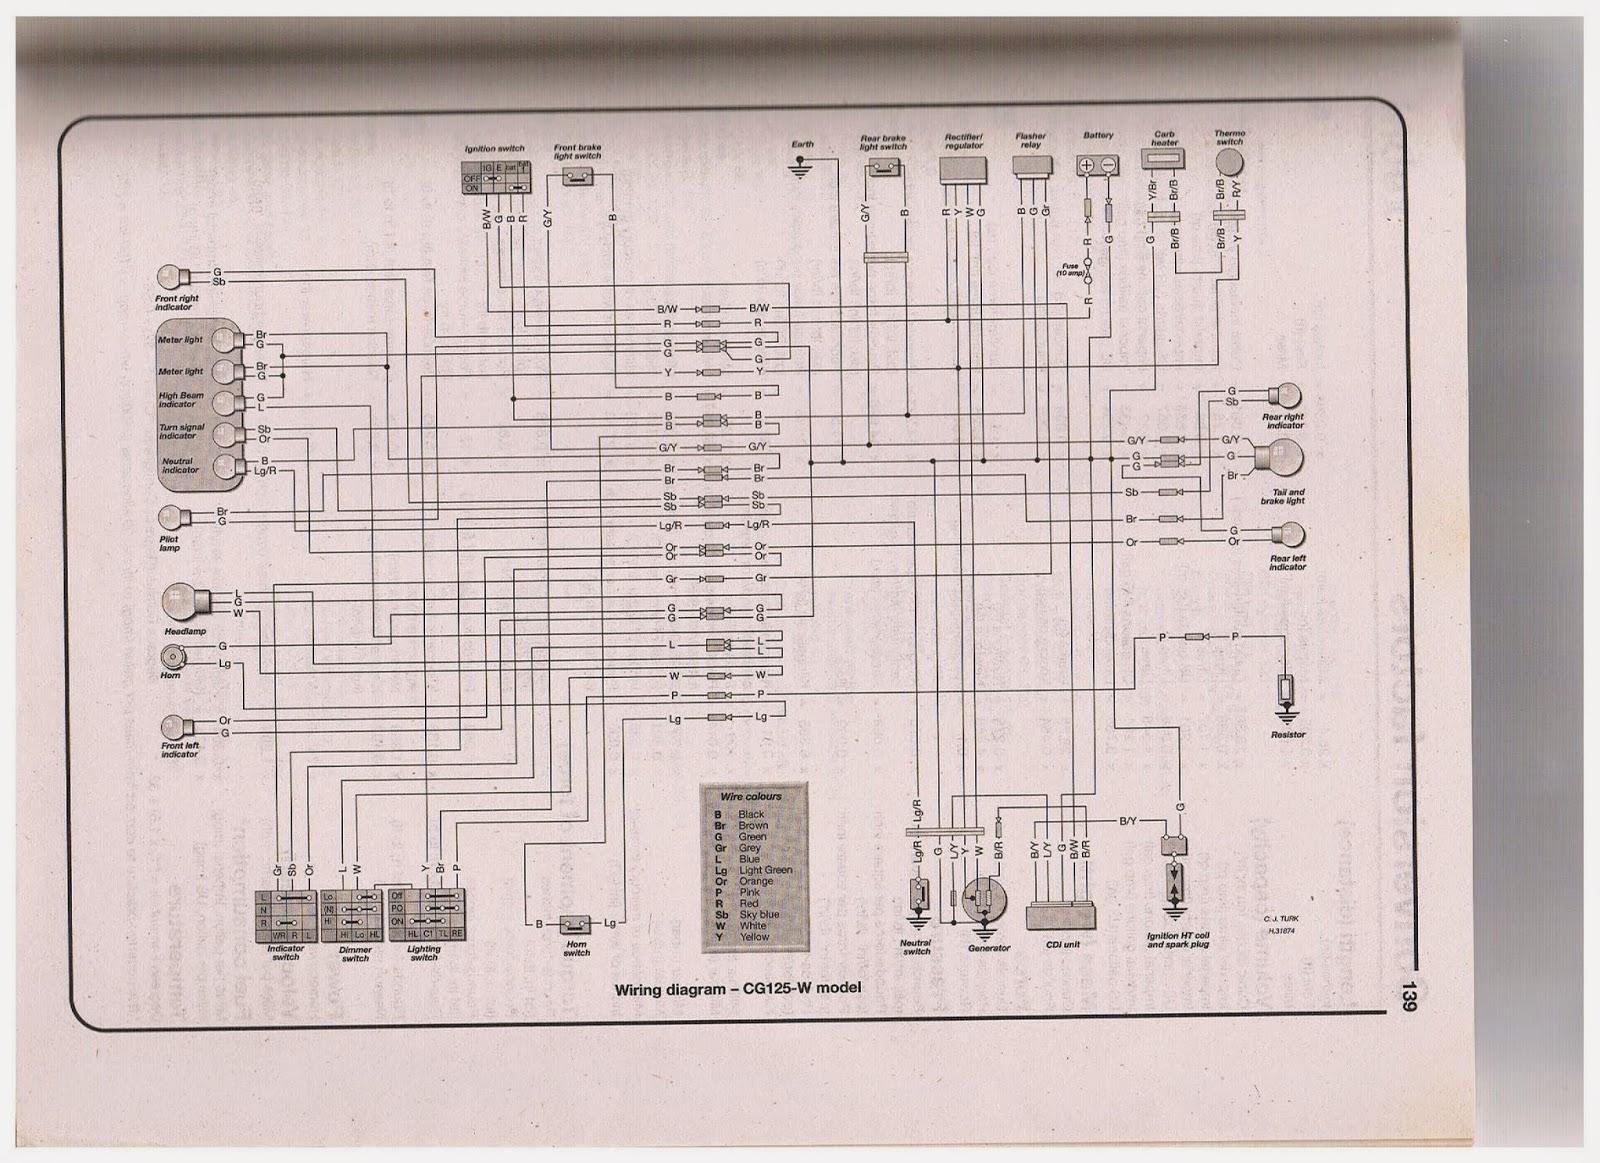 honda cg 125 wiring diagram wiring diagram forward honda 125cc wiring [ 1600 x 1163 Pixel ]